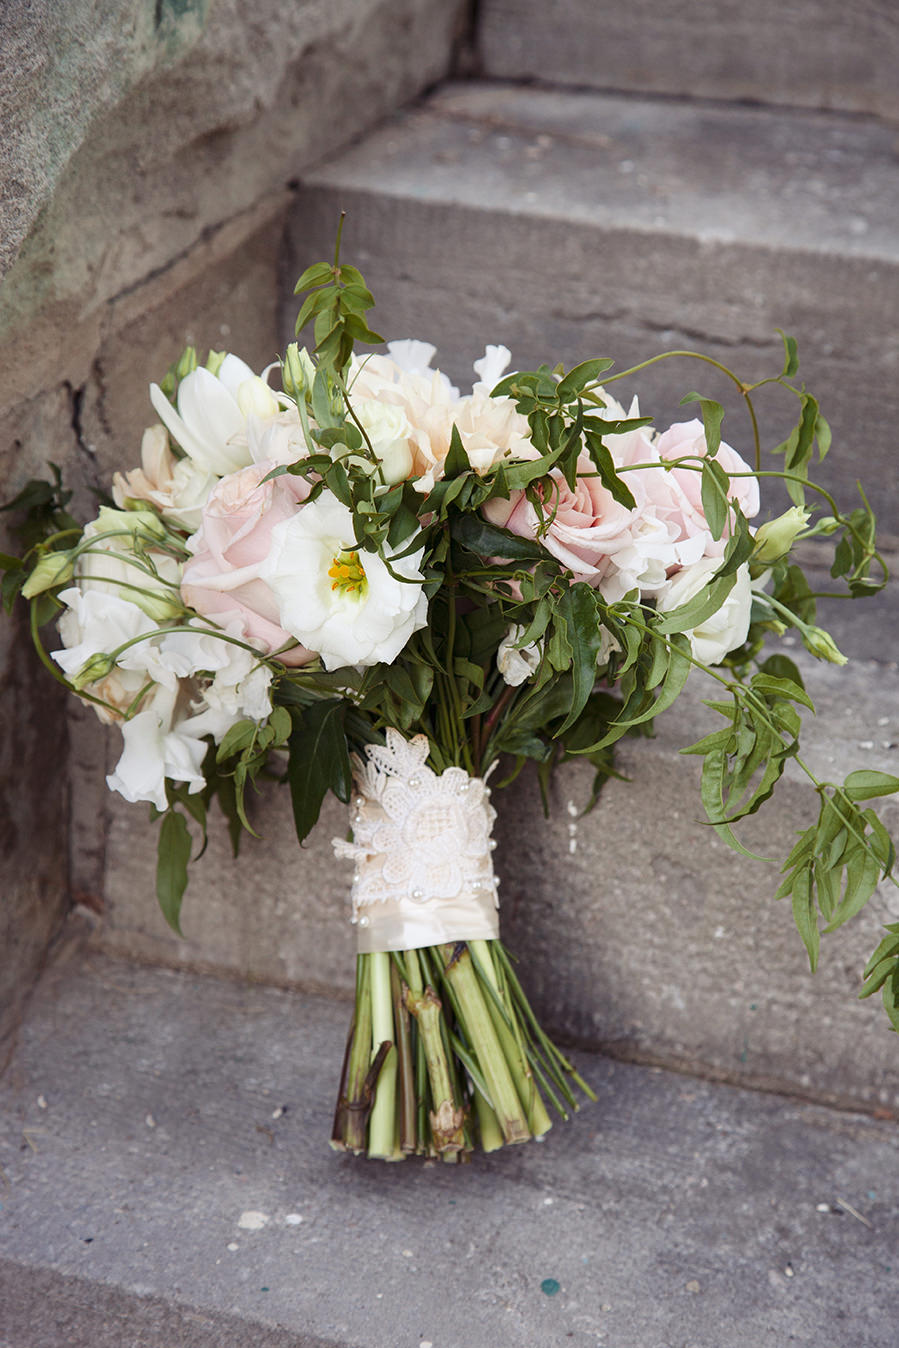 St-Catharines-Wedding-Stone-Mill-Inn-Amy-Darryl-photography-by-Morgan-Falk-053.JPG